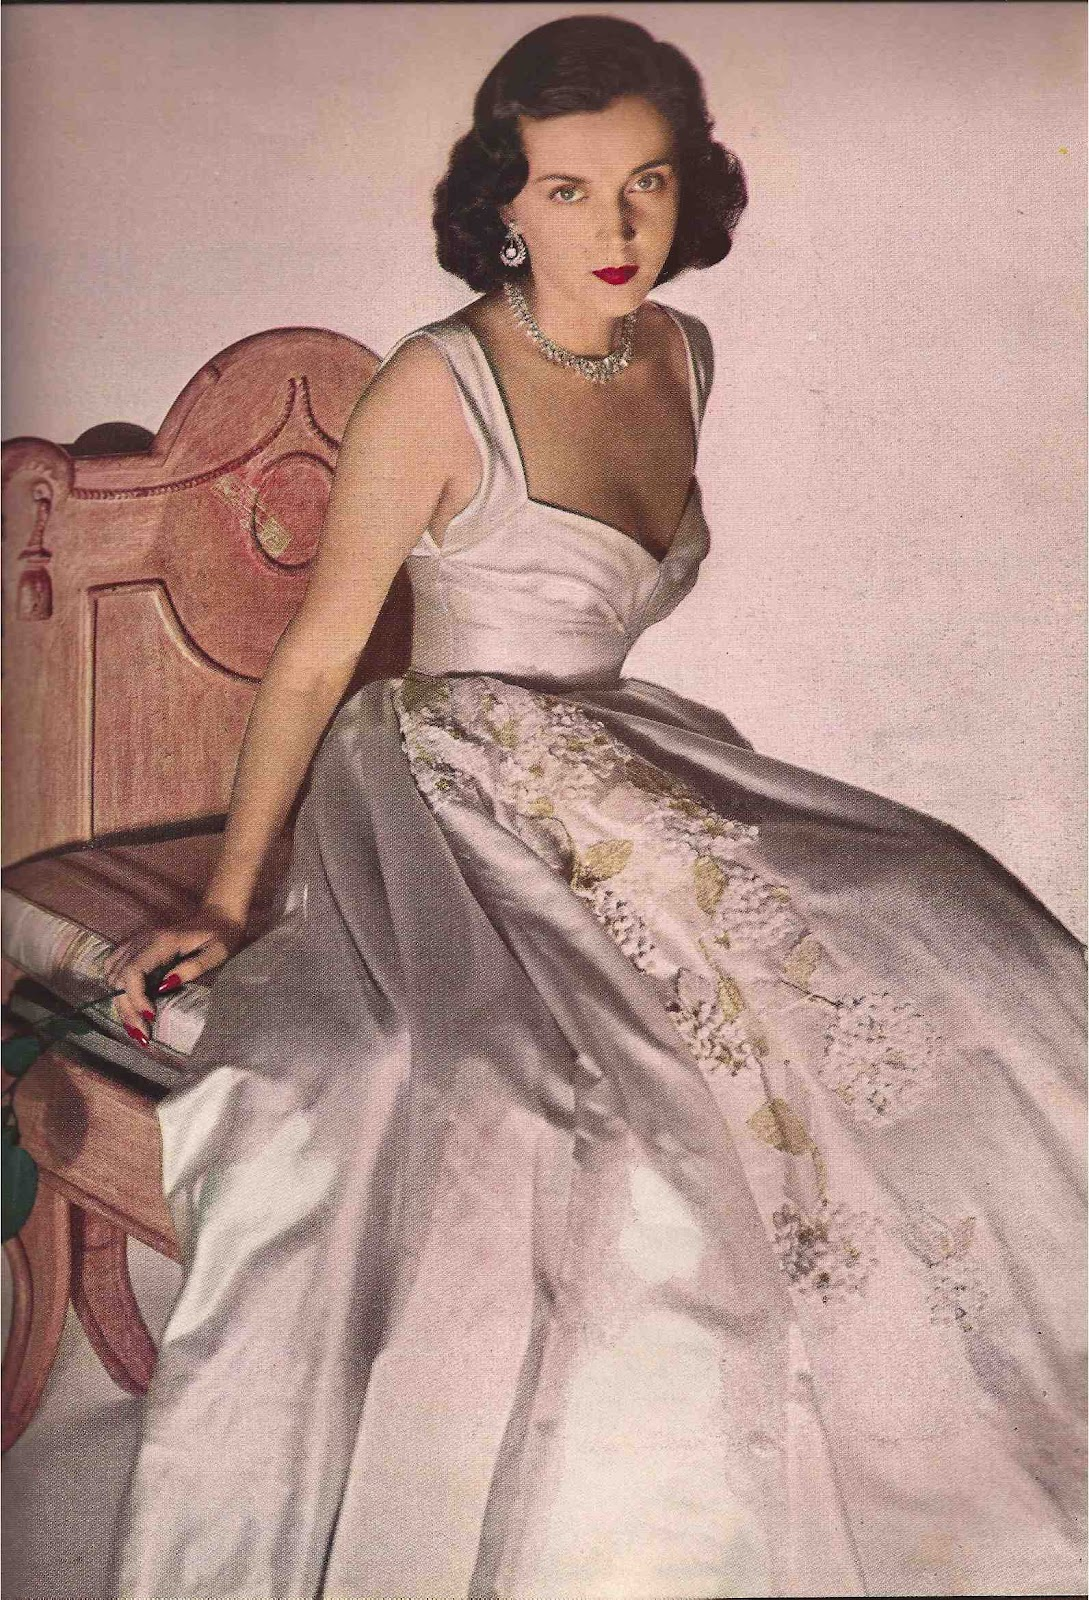 http://3.bp.blogspot.com/-bjyhdq3BkXA/T87ctTnVM6I/AAAAAAAAGcQ/zDkx6Sm4gSg/s1600/Harper\'s+Bazaar+October+1948.jpg